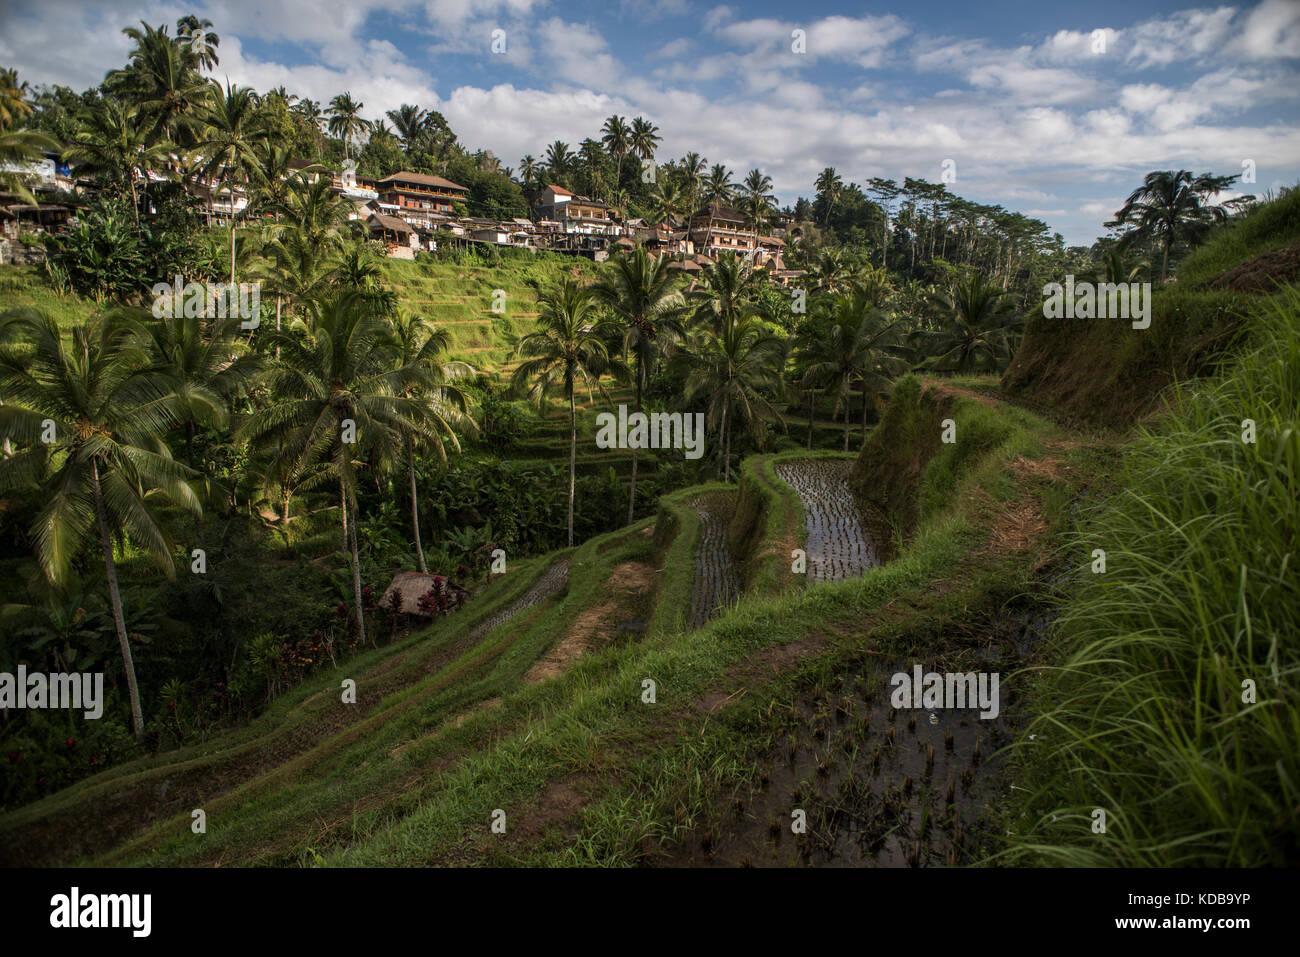 Paddy field rice farming terraces stock photos paddy for Terrace ubud bali